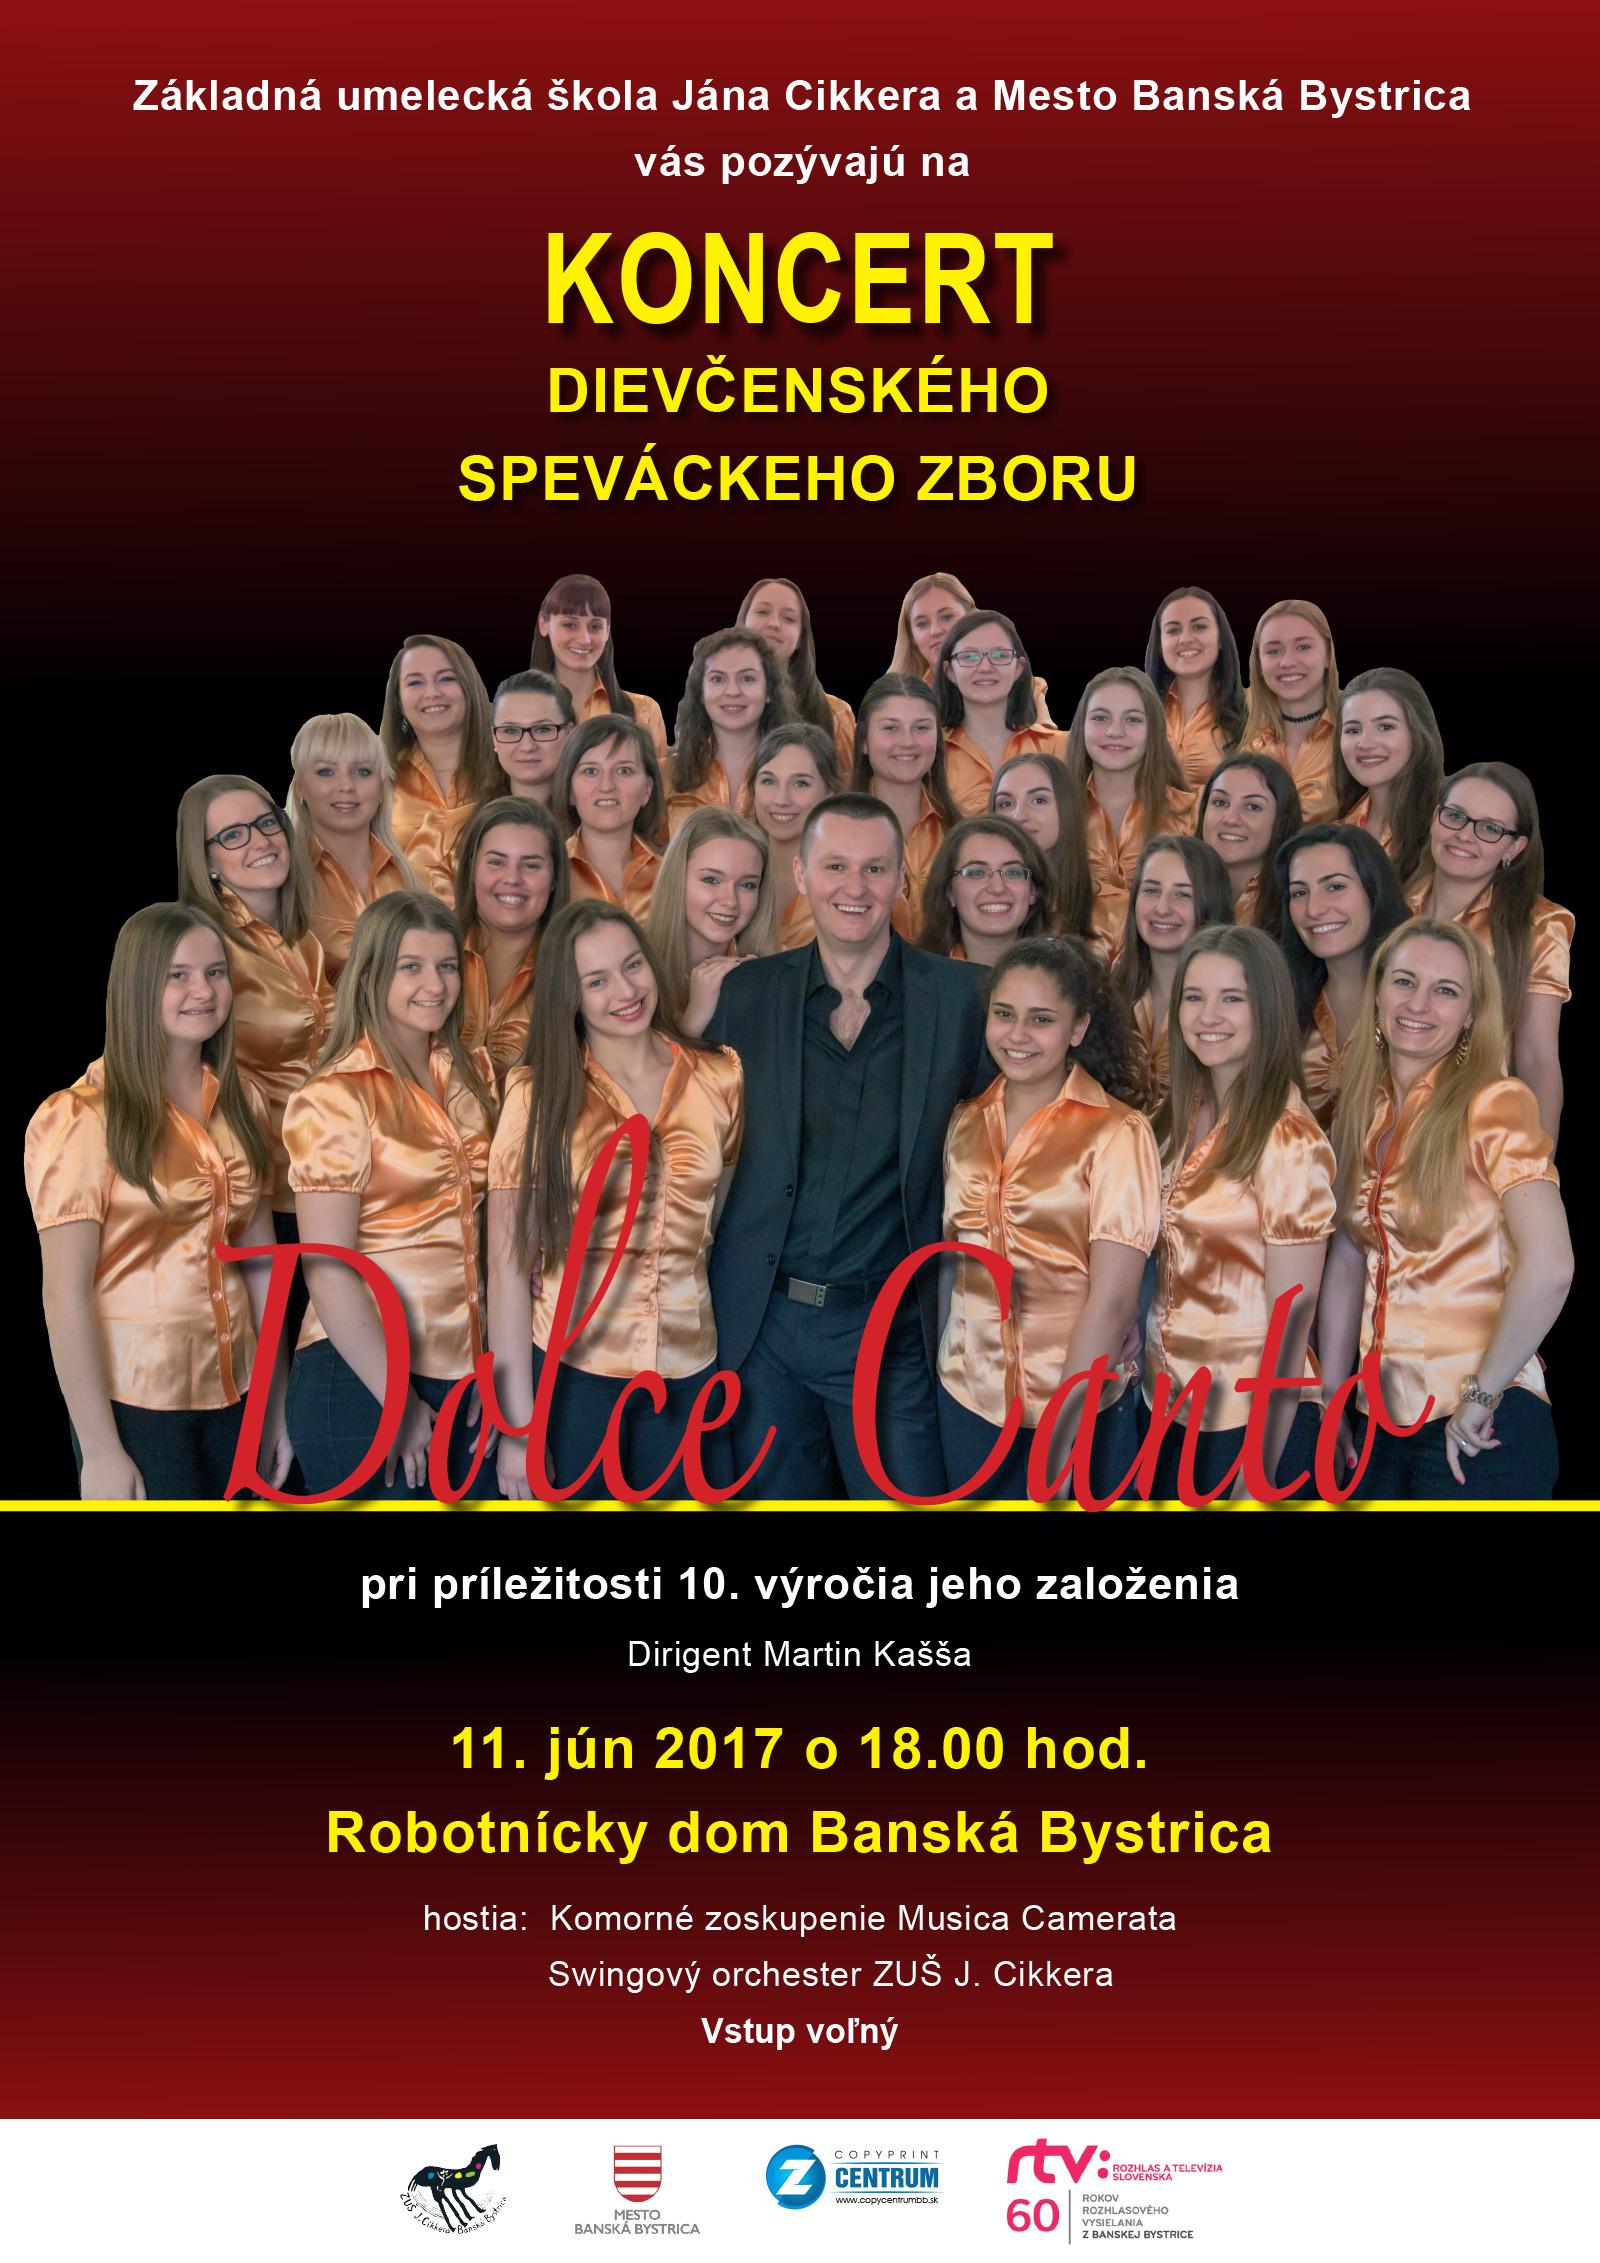 Dolce Canto 10vyr2017